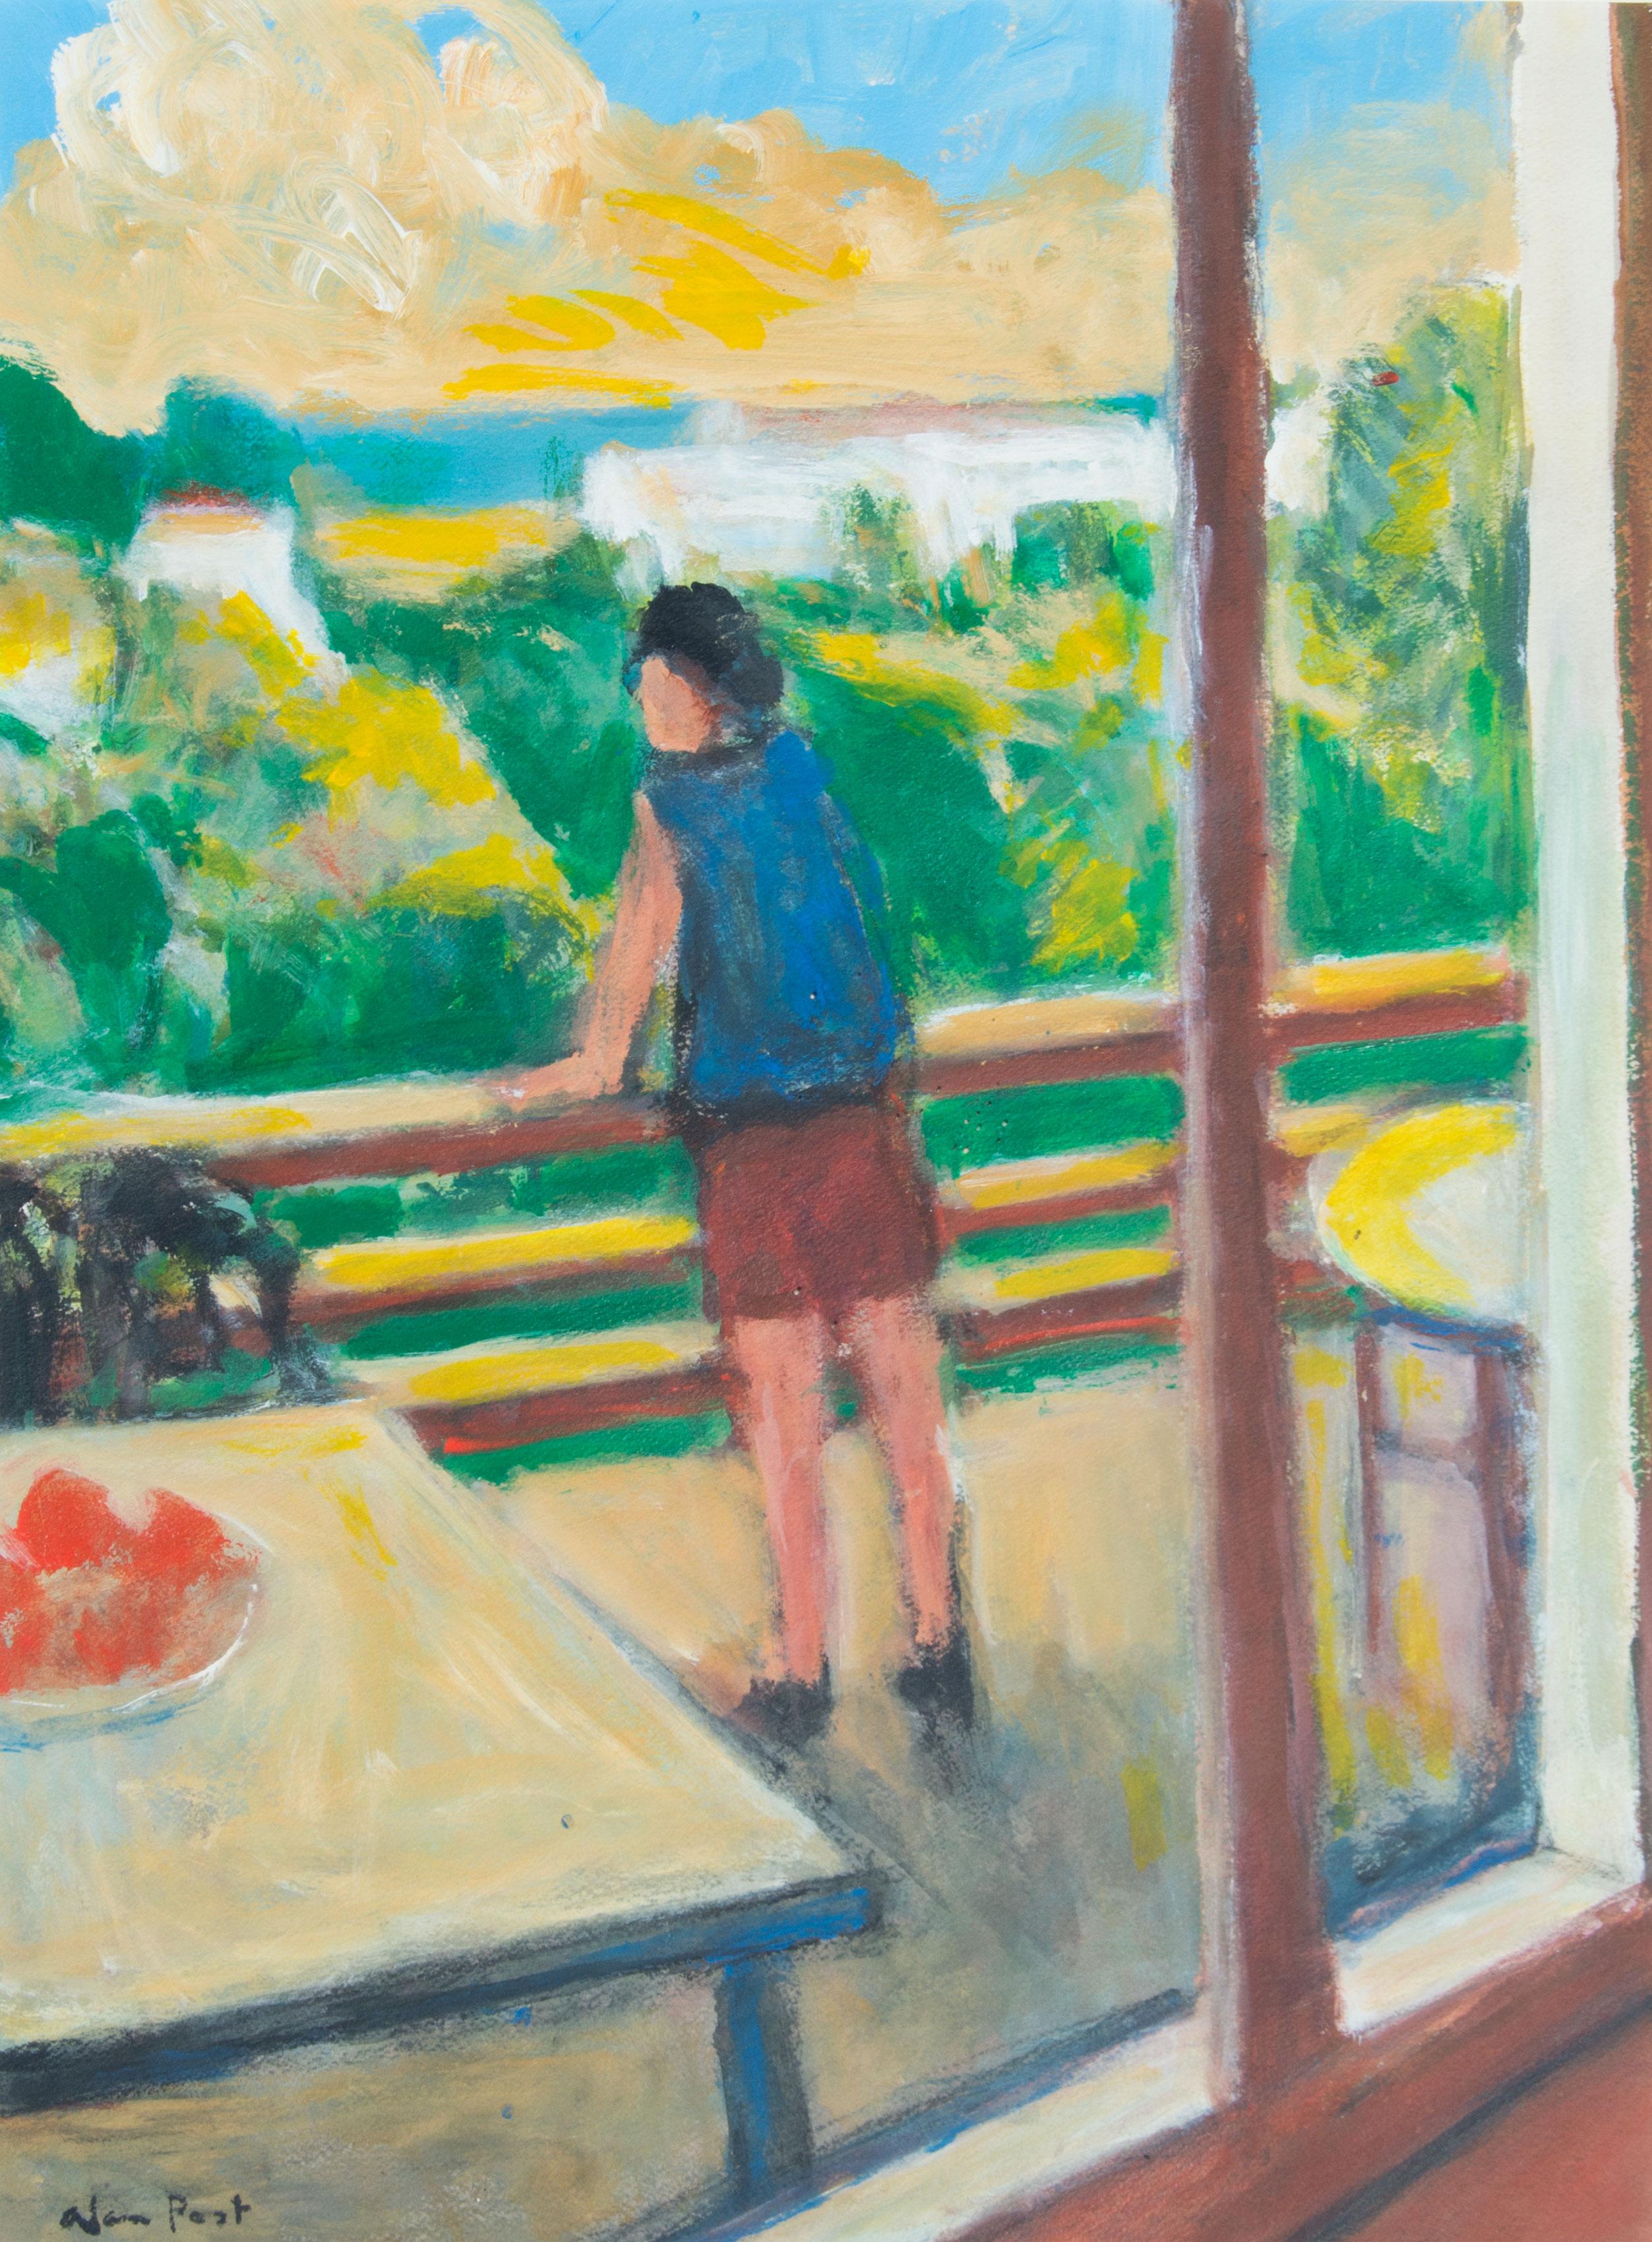 Alan Post, The Terrace At Las Playetas, 2002